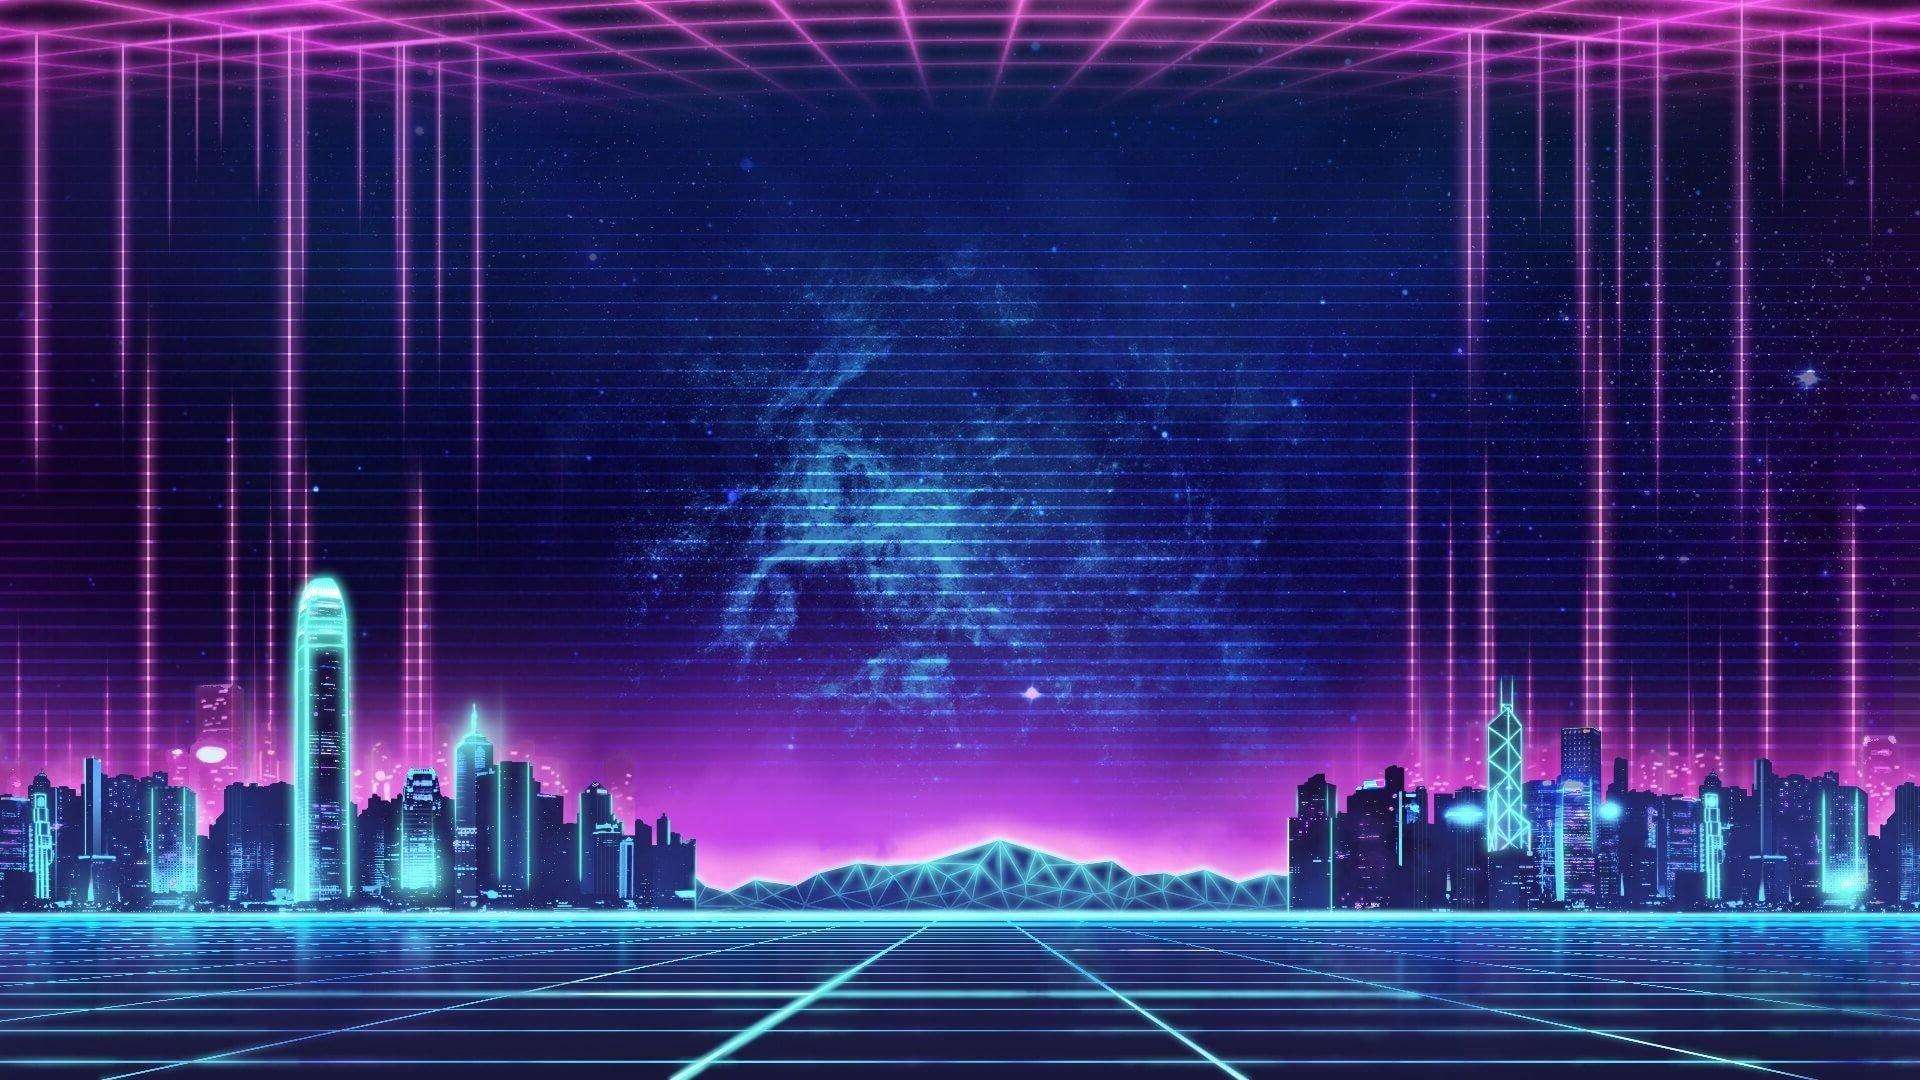 Cyber Wallpaper Free Download